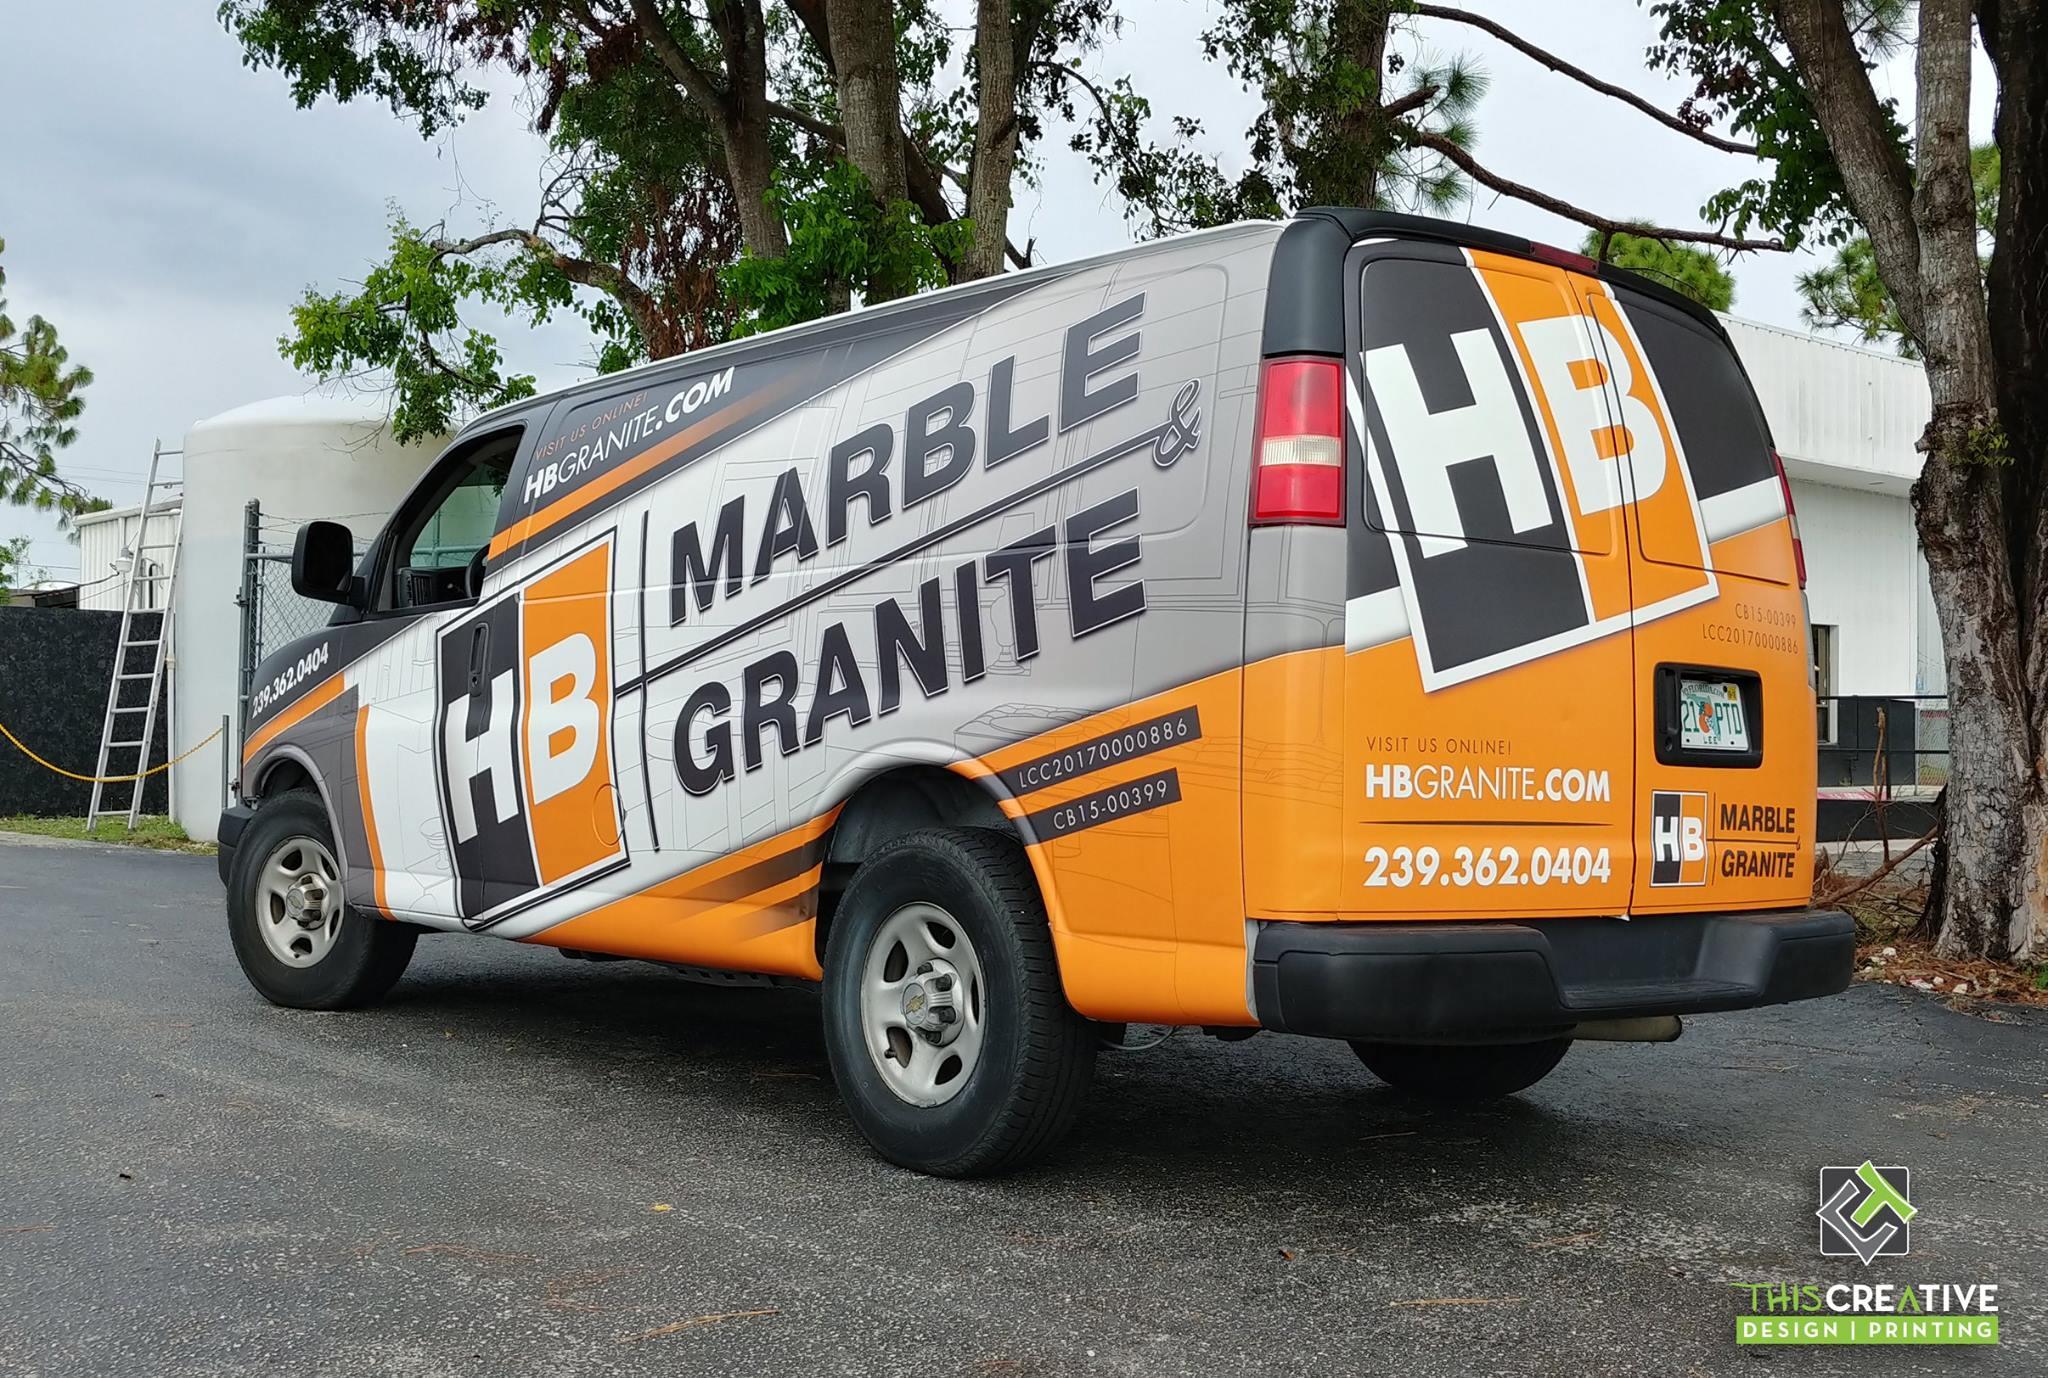 HB Marble and Granite